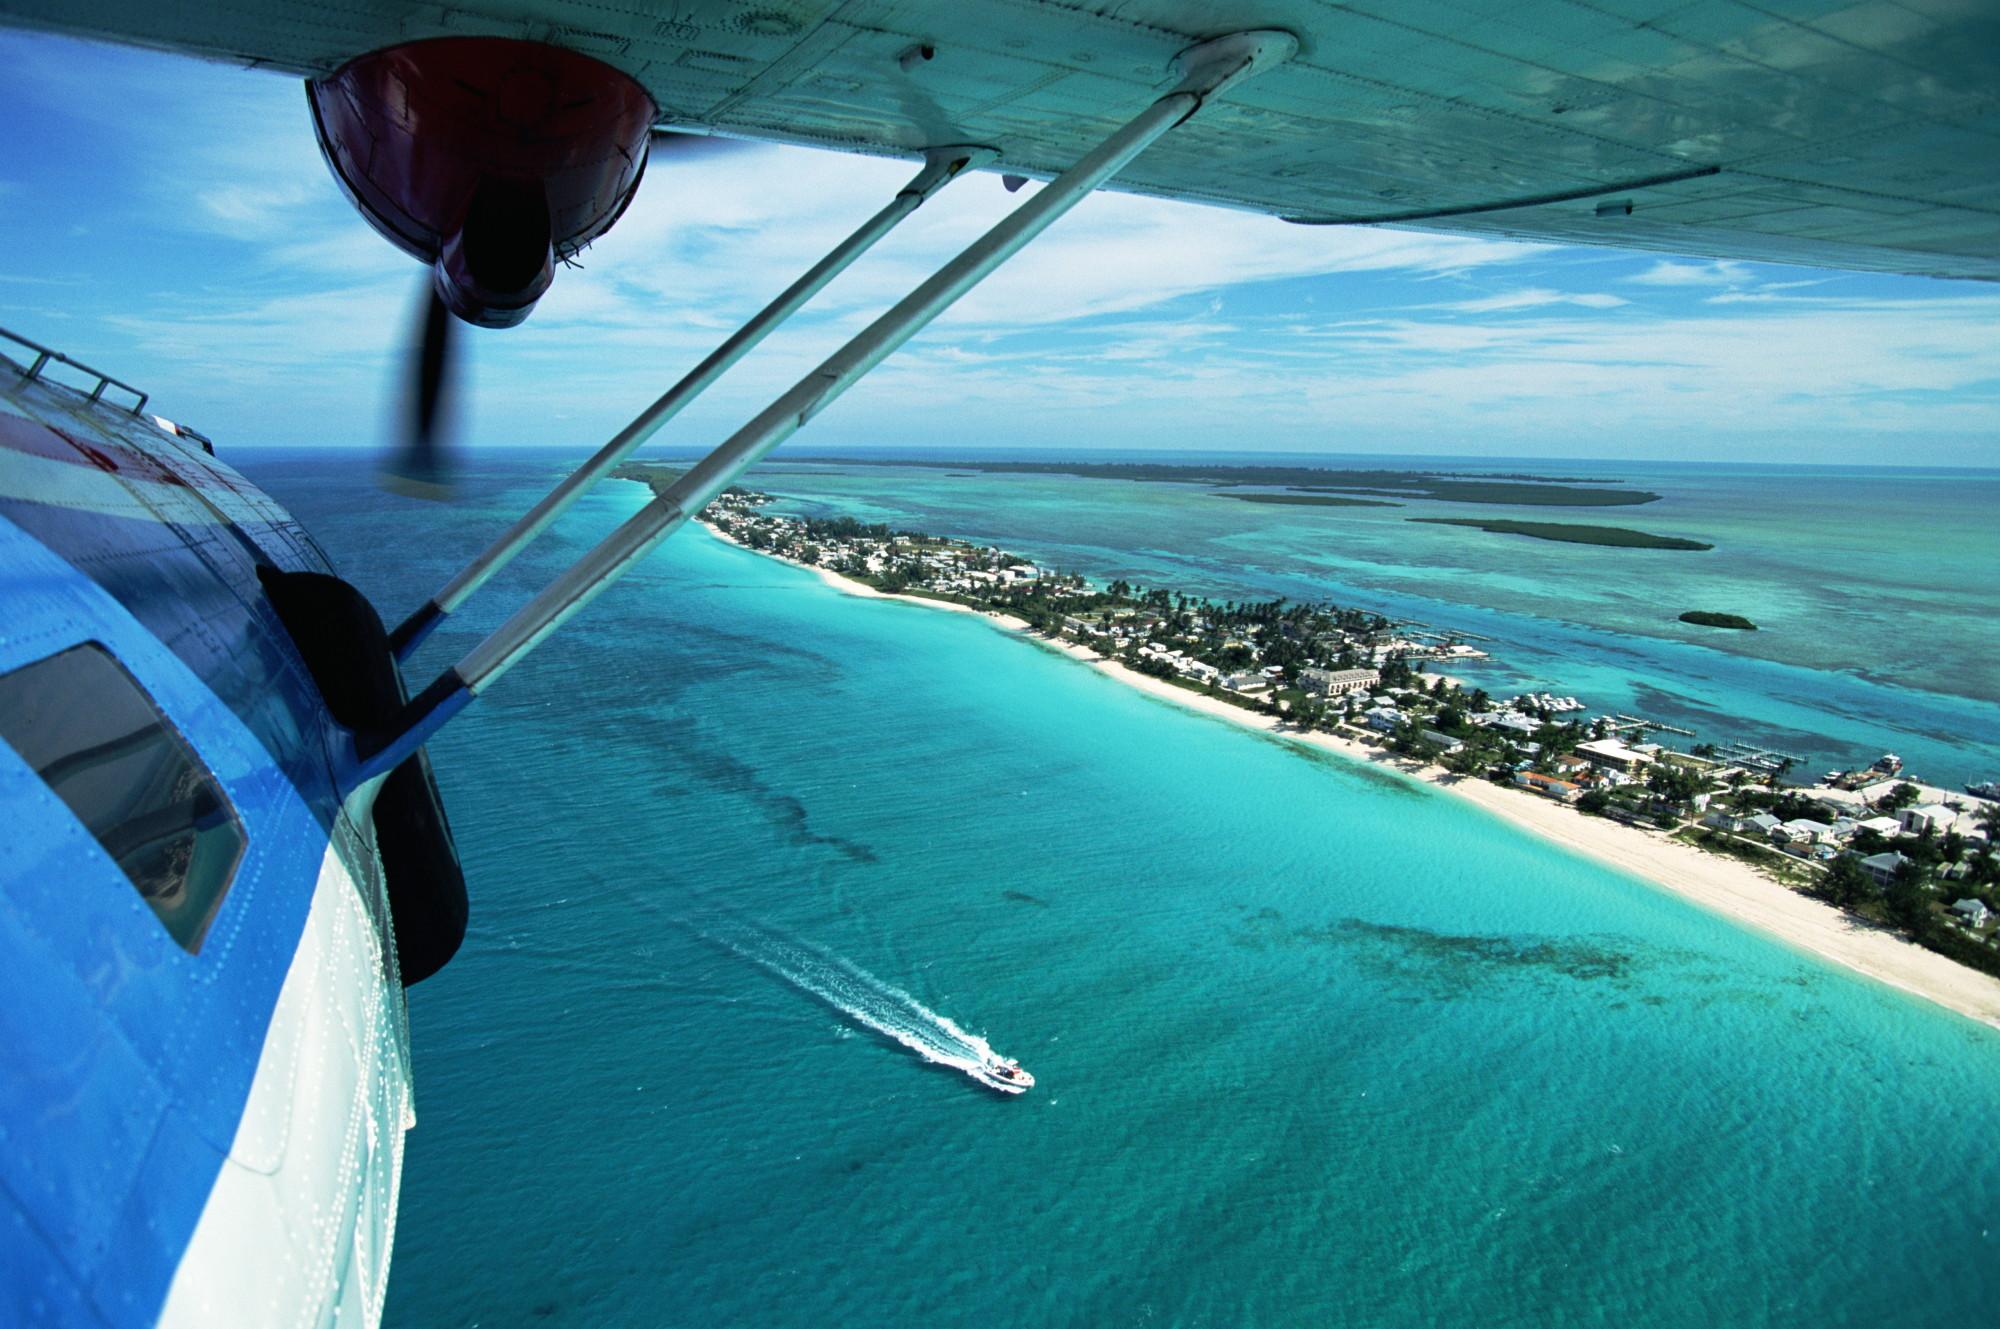 Bimini Bahamas  city images : Bimini Bahamas Photos Photographs Pictures Vacation Picture